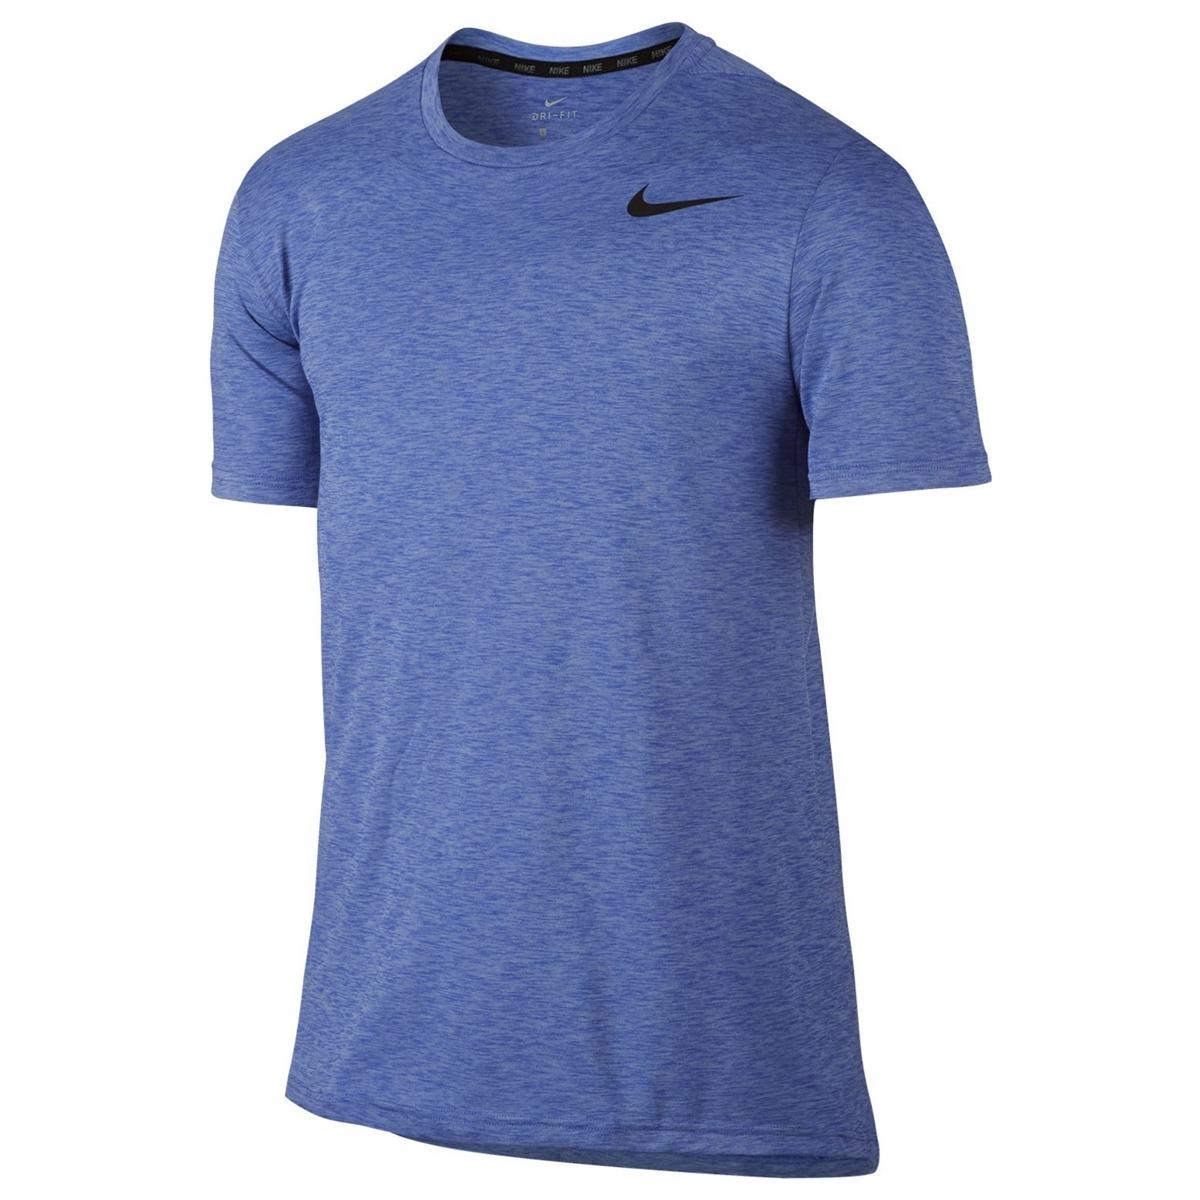 5c59ebdb5f ... camiseta camisa blusa nike breathe top ss masculina original.  Carregando zoom. e1153e32df5aa7 ...